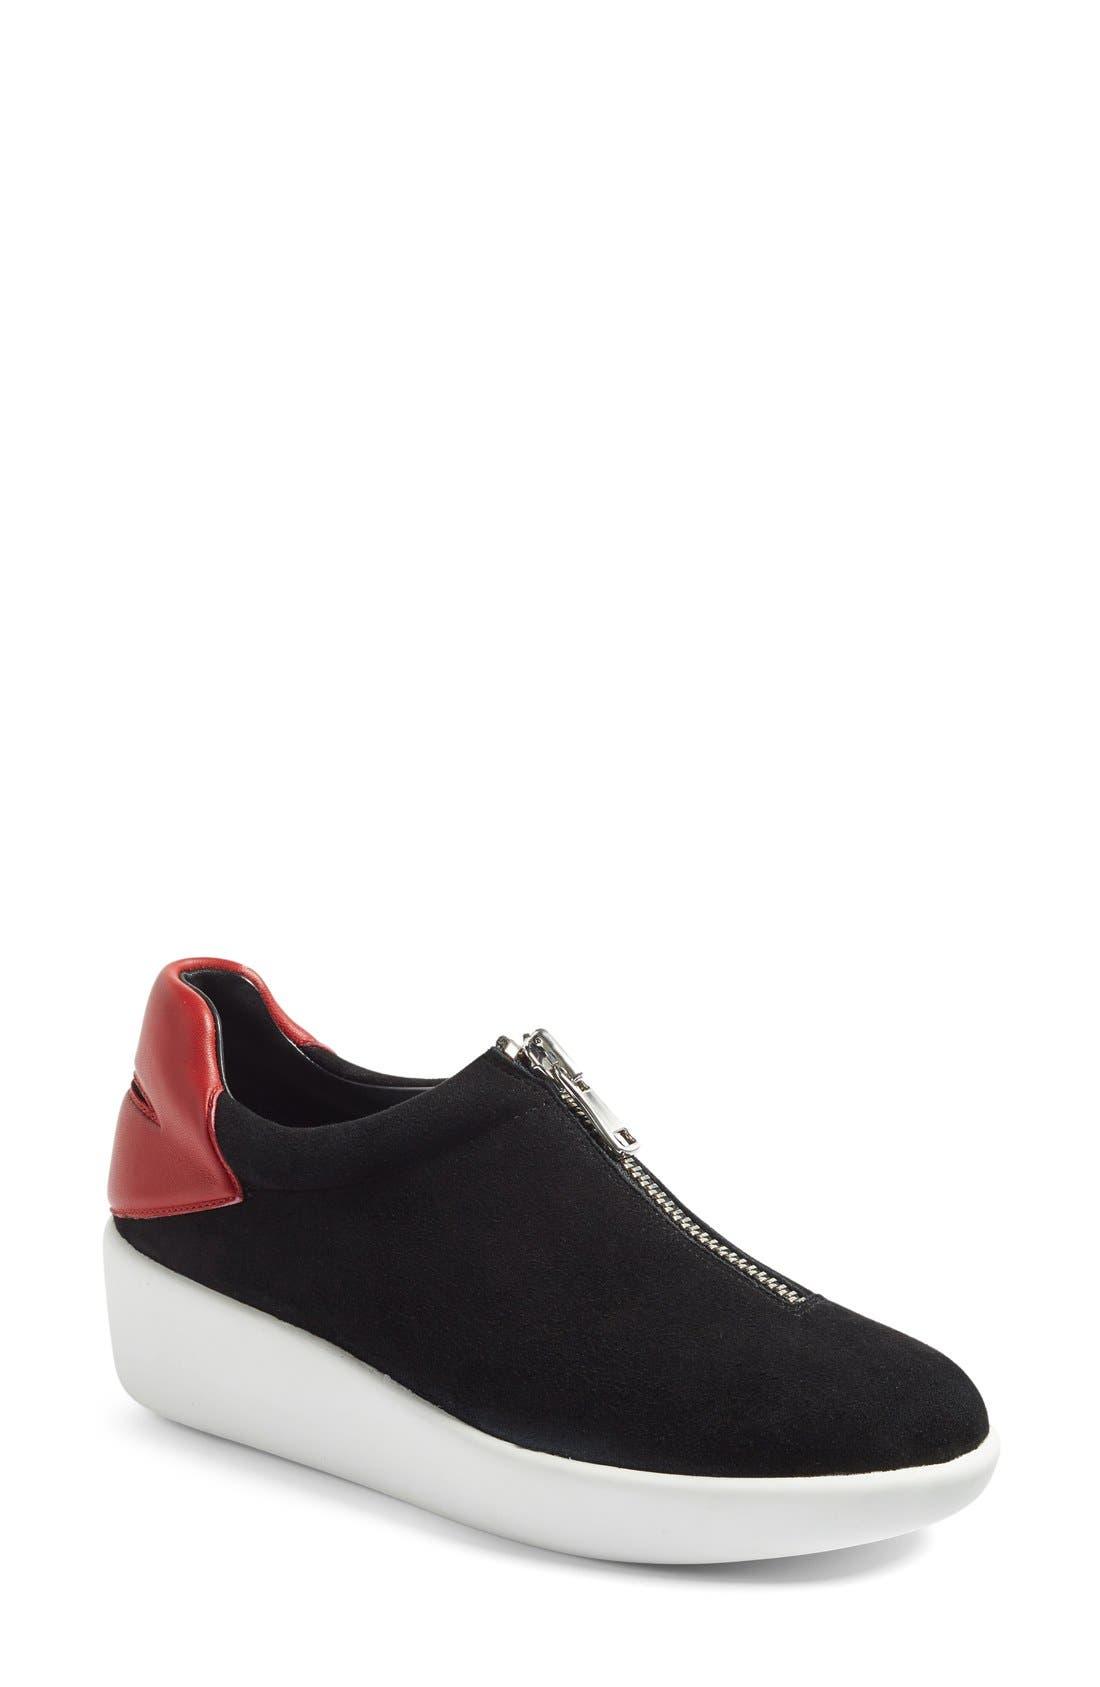 Main Image - Alice + Olivia 'Laney' Zip Platform Sneaker (Women)